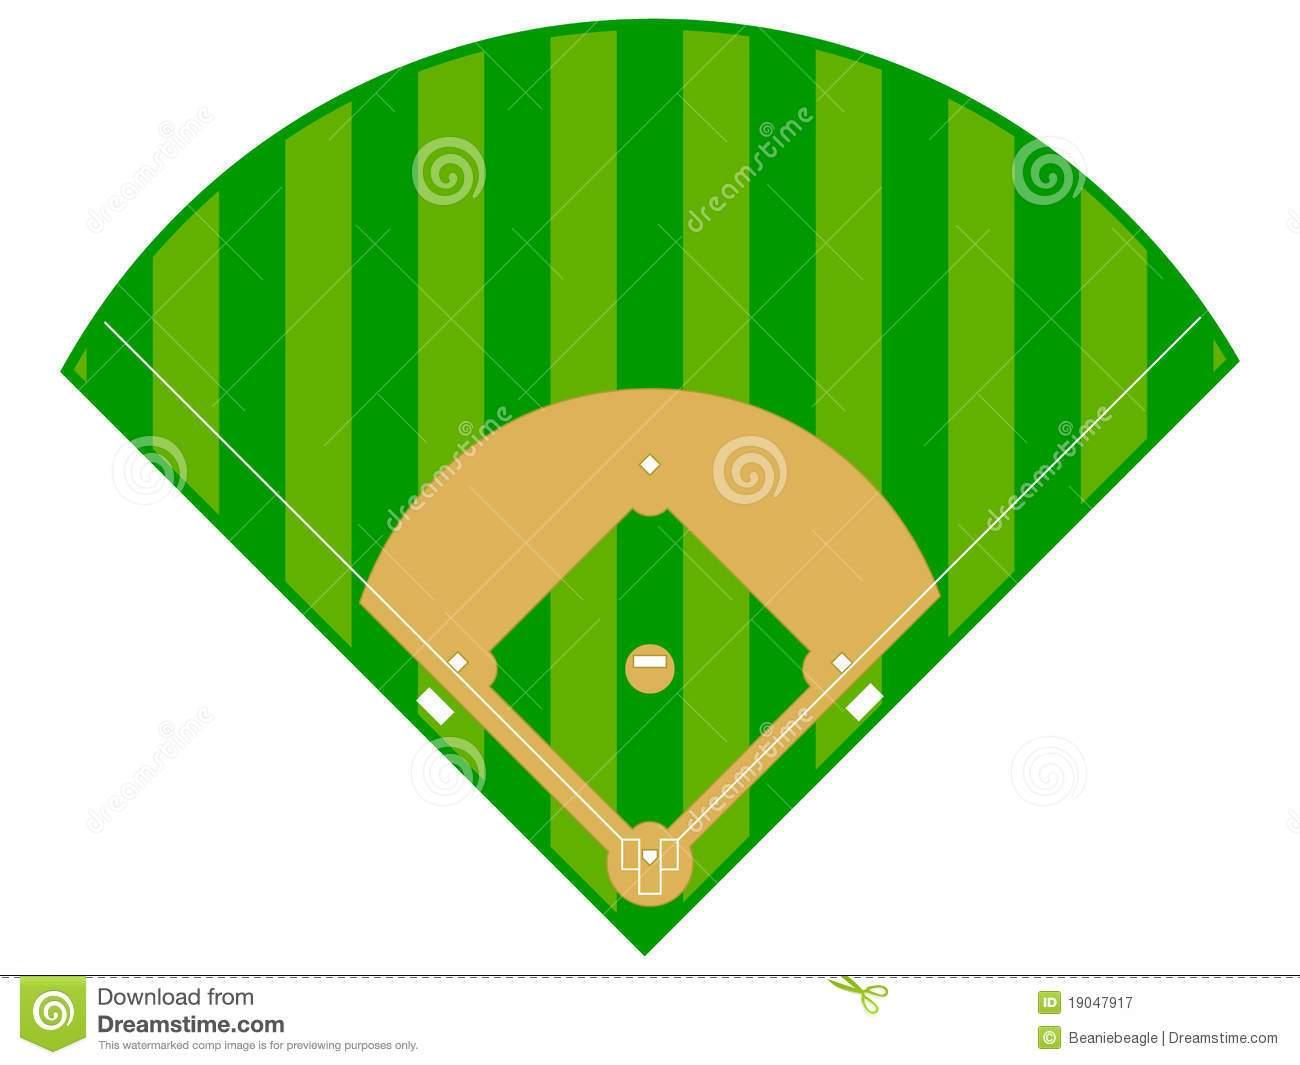 Baseball stadium clipart 8 » Clipart Portal.